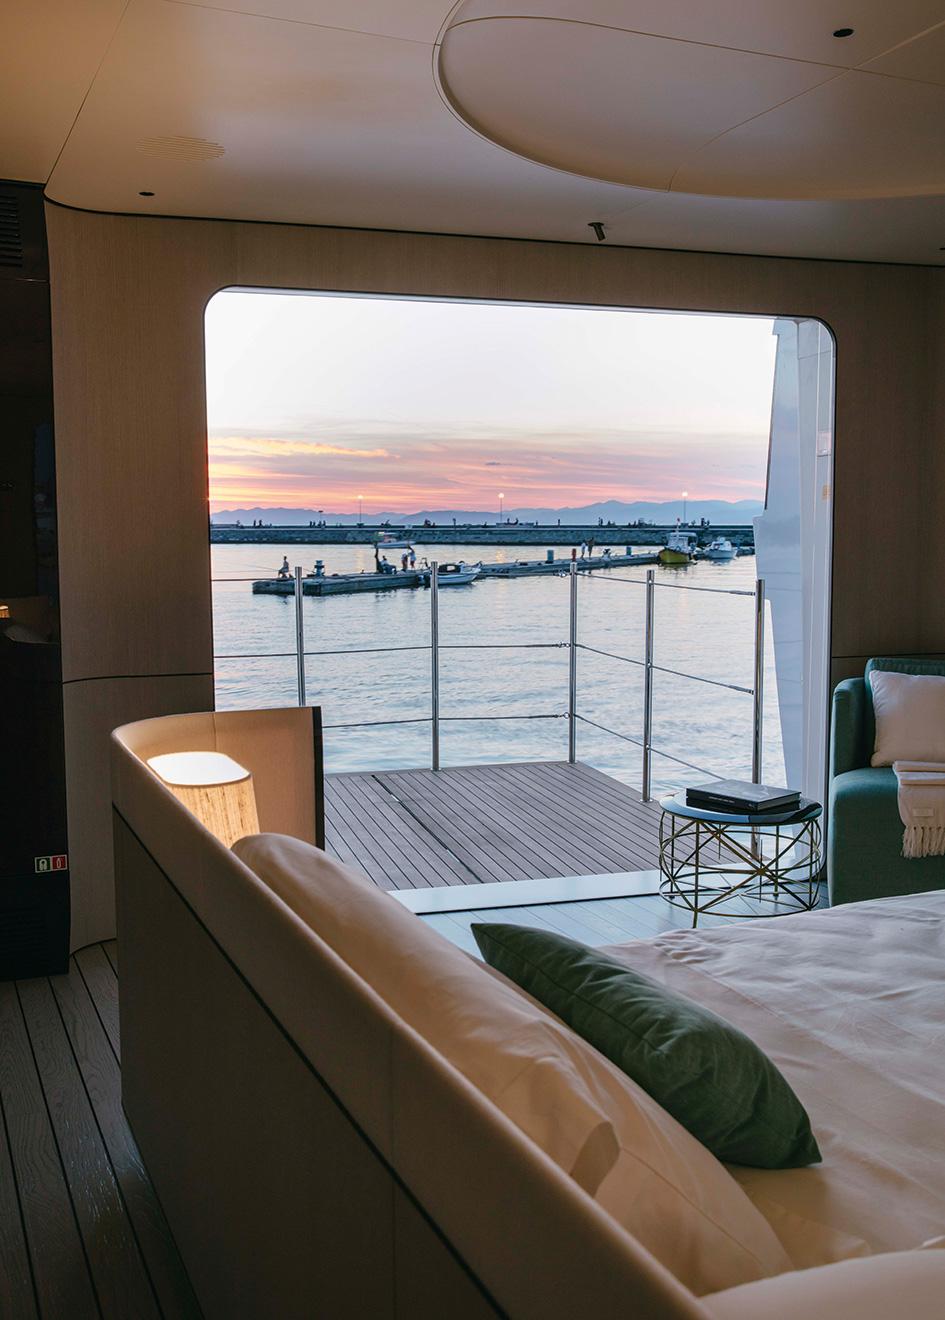 the-balcony-of-the-azimut-grande-35-metri-yacht